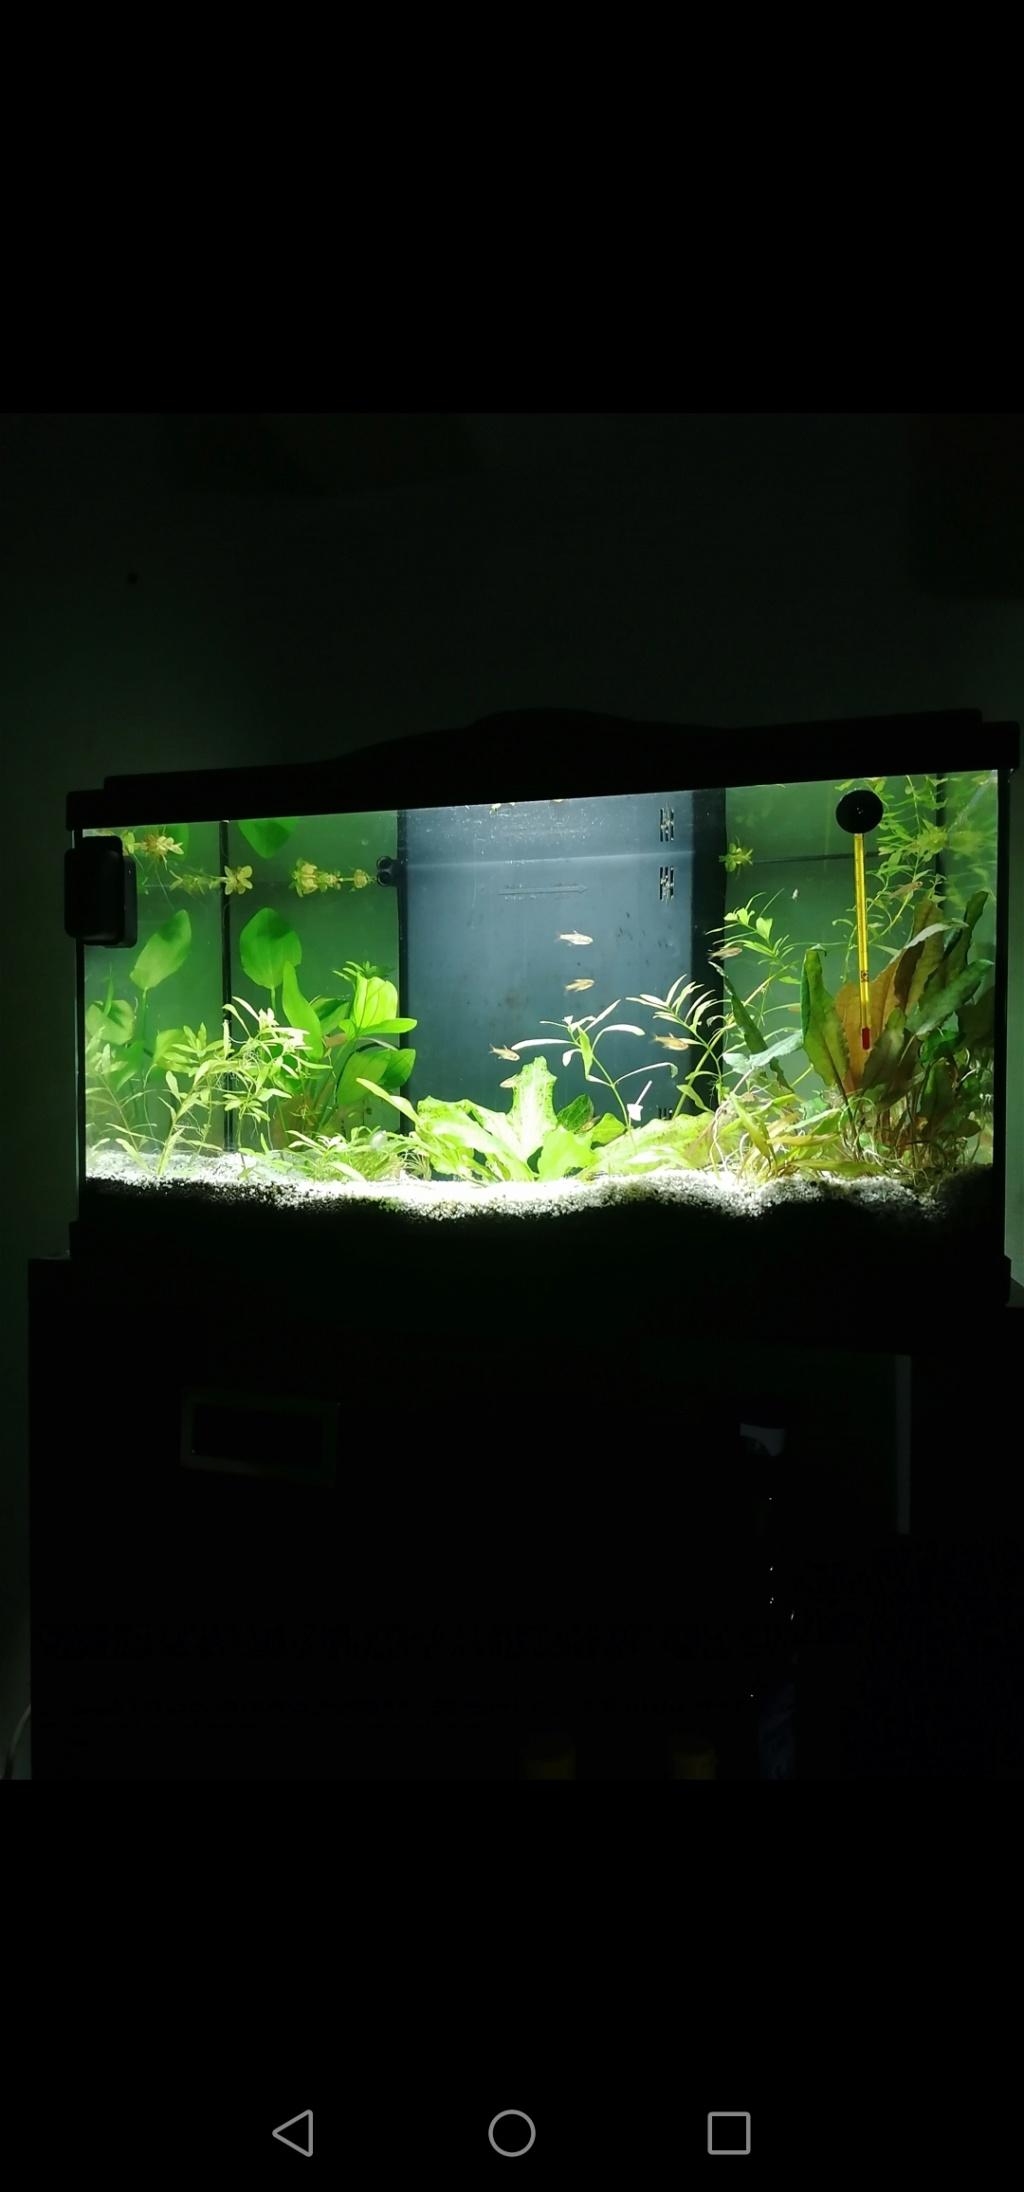 Les aquariums du confinement Screen22